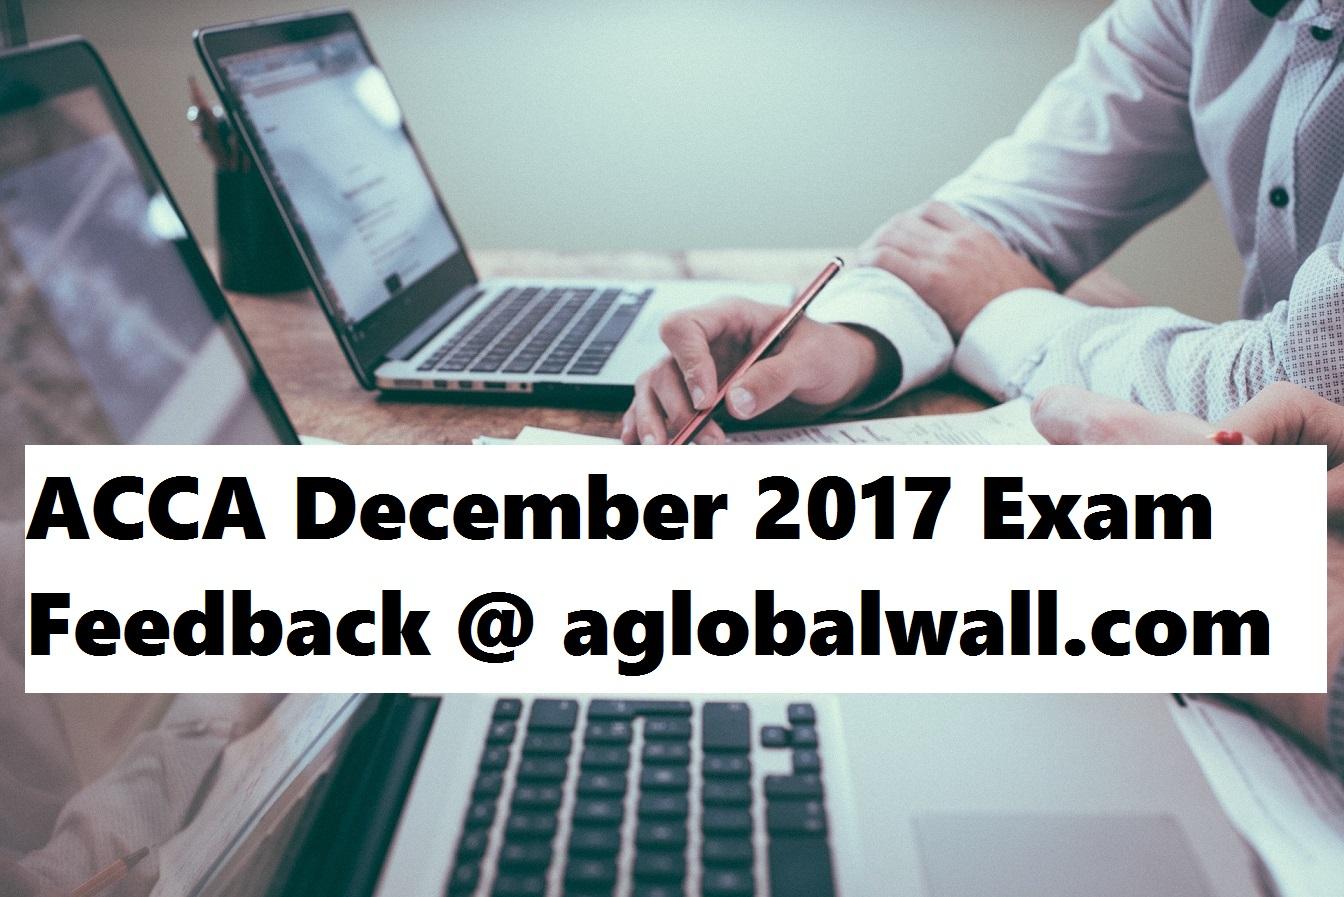 ACCA December 2017 Exam Feedback